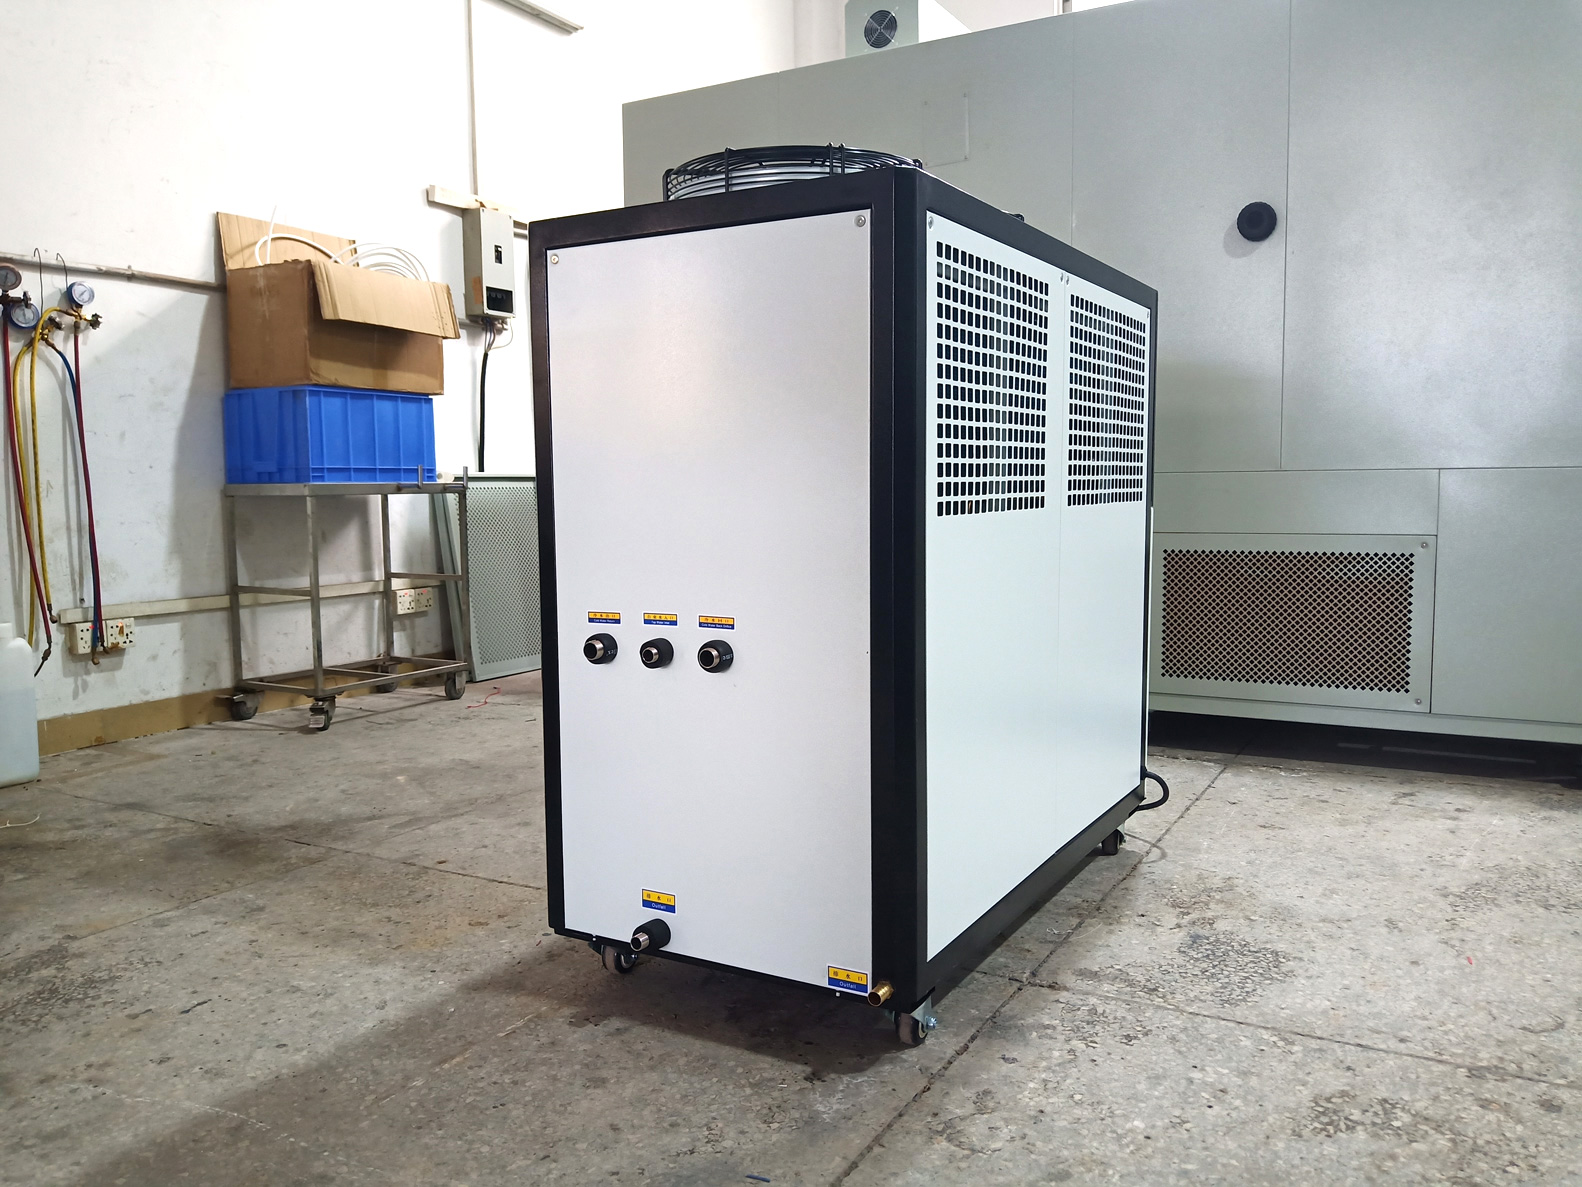 Wewon's GW531B model industrial water chiller